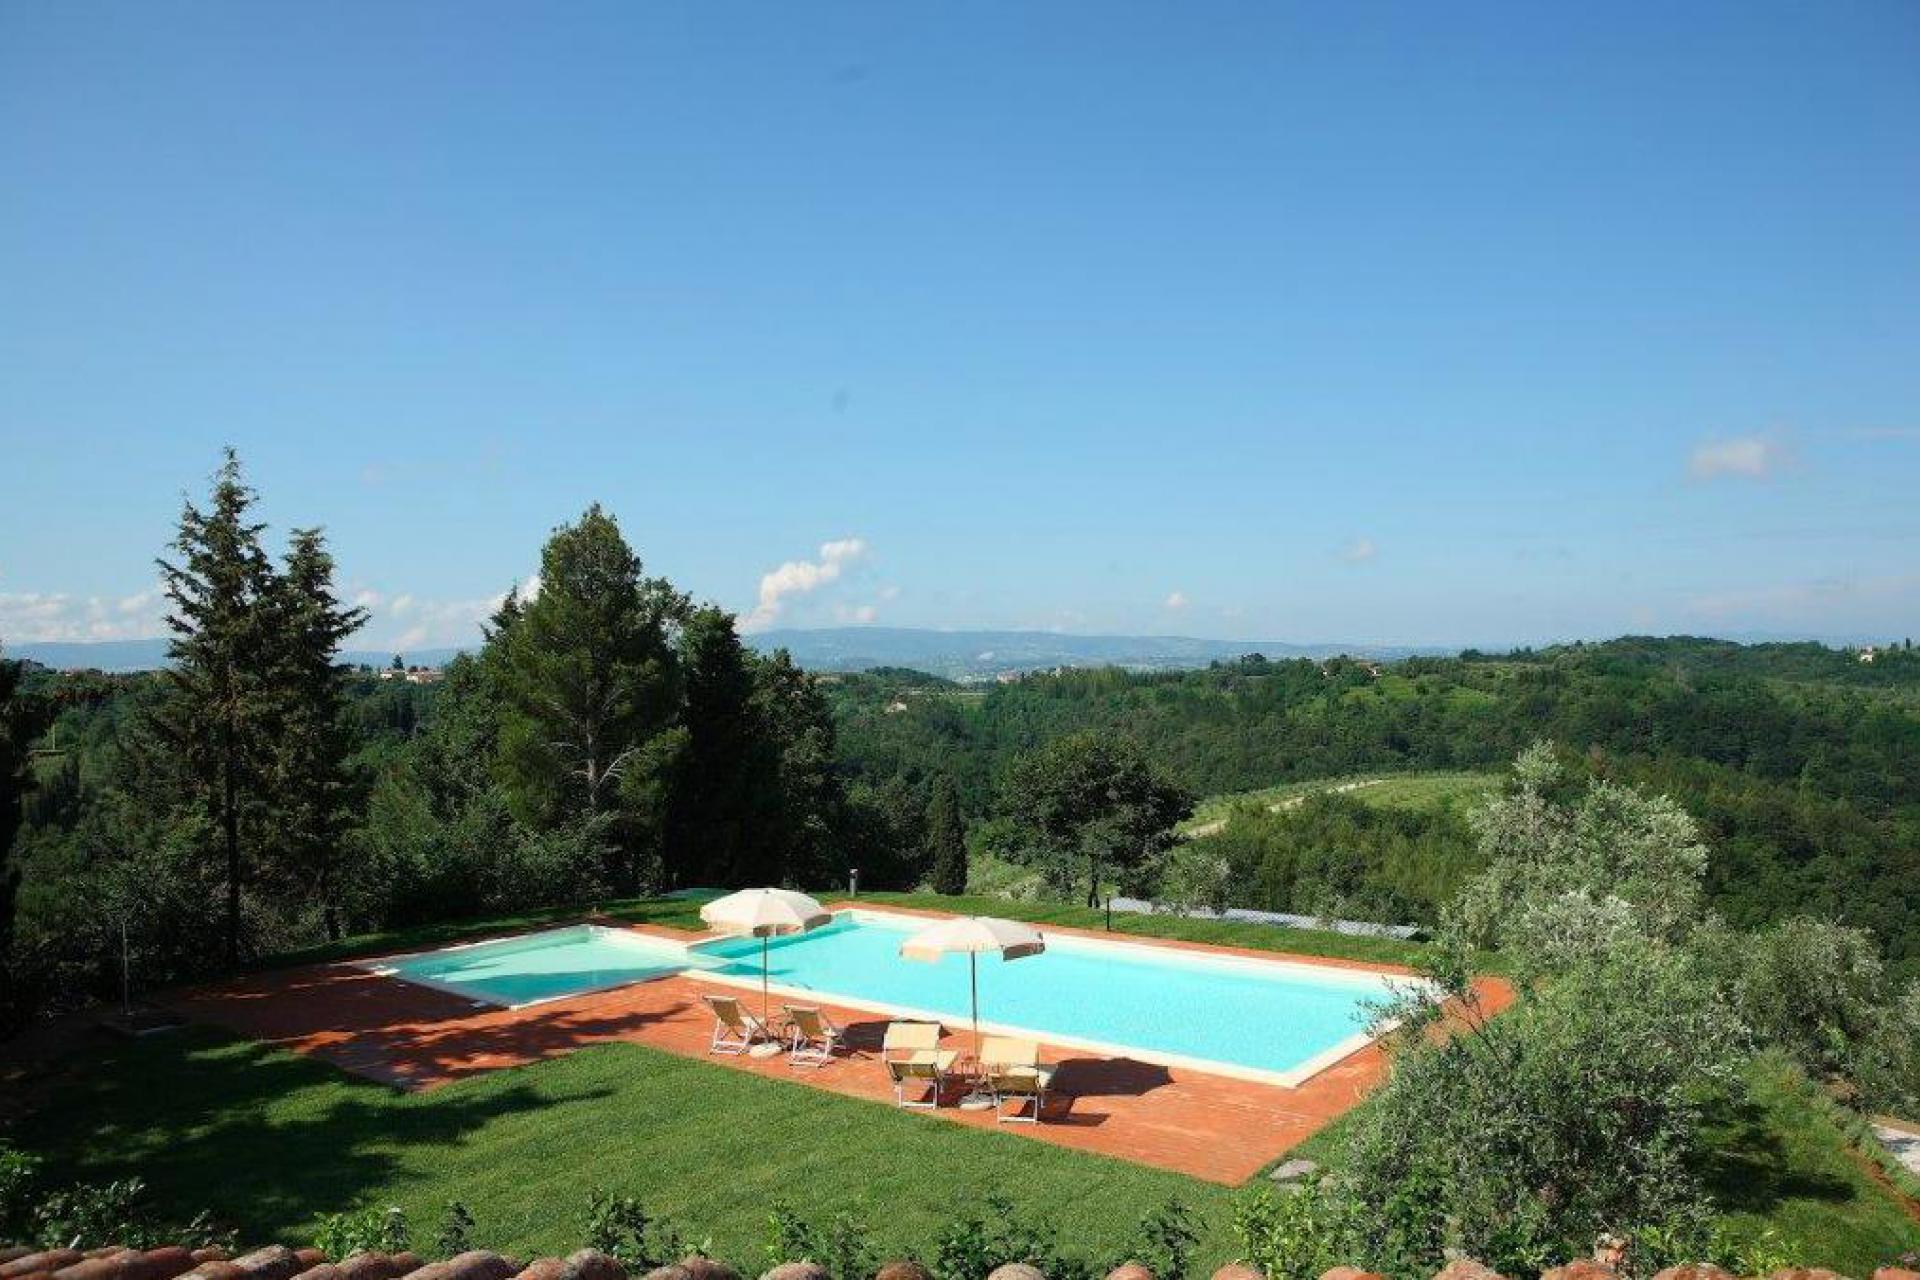 Agriturismo Toscana Agriturismo adatto alle famiglie vicino Lucca, Toscana